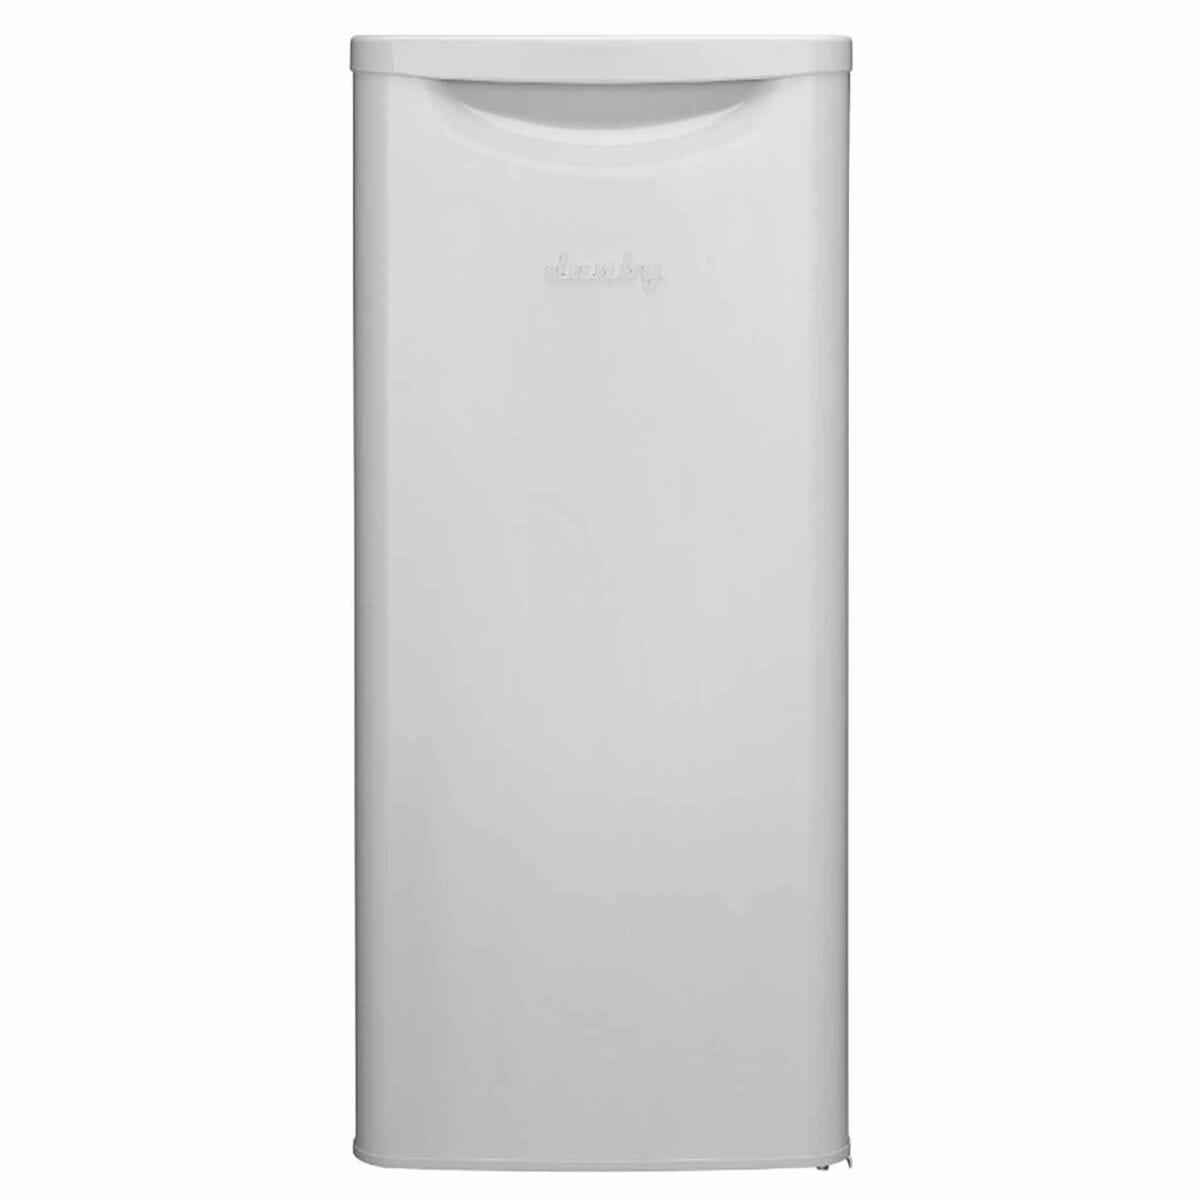 Danby Under Counter Fridge Freezer 91 Litre